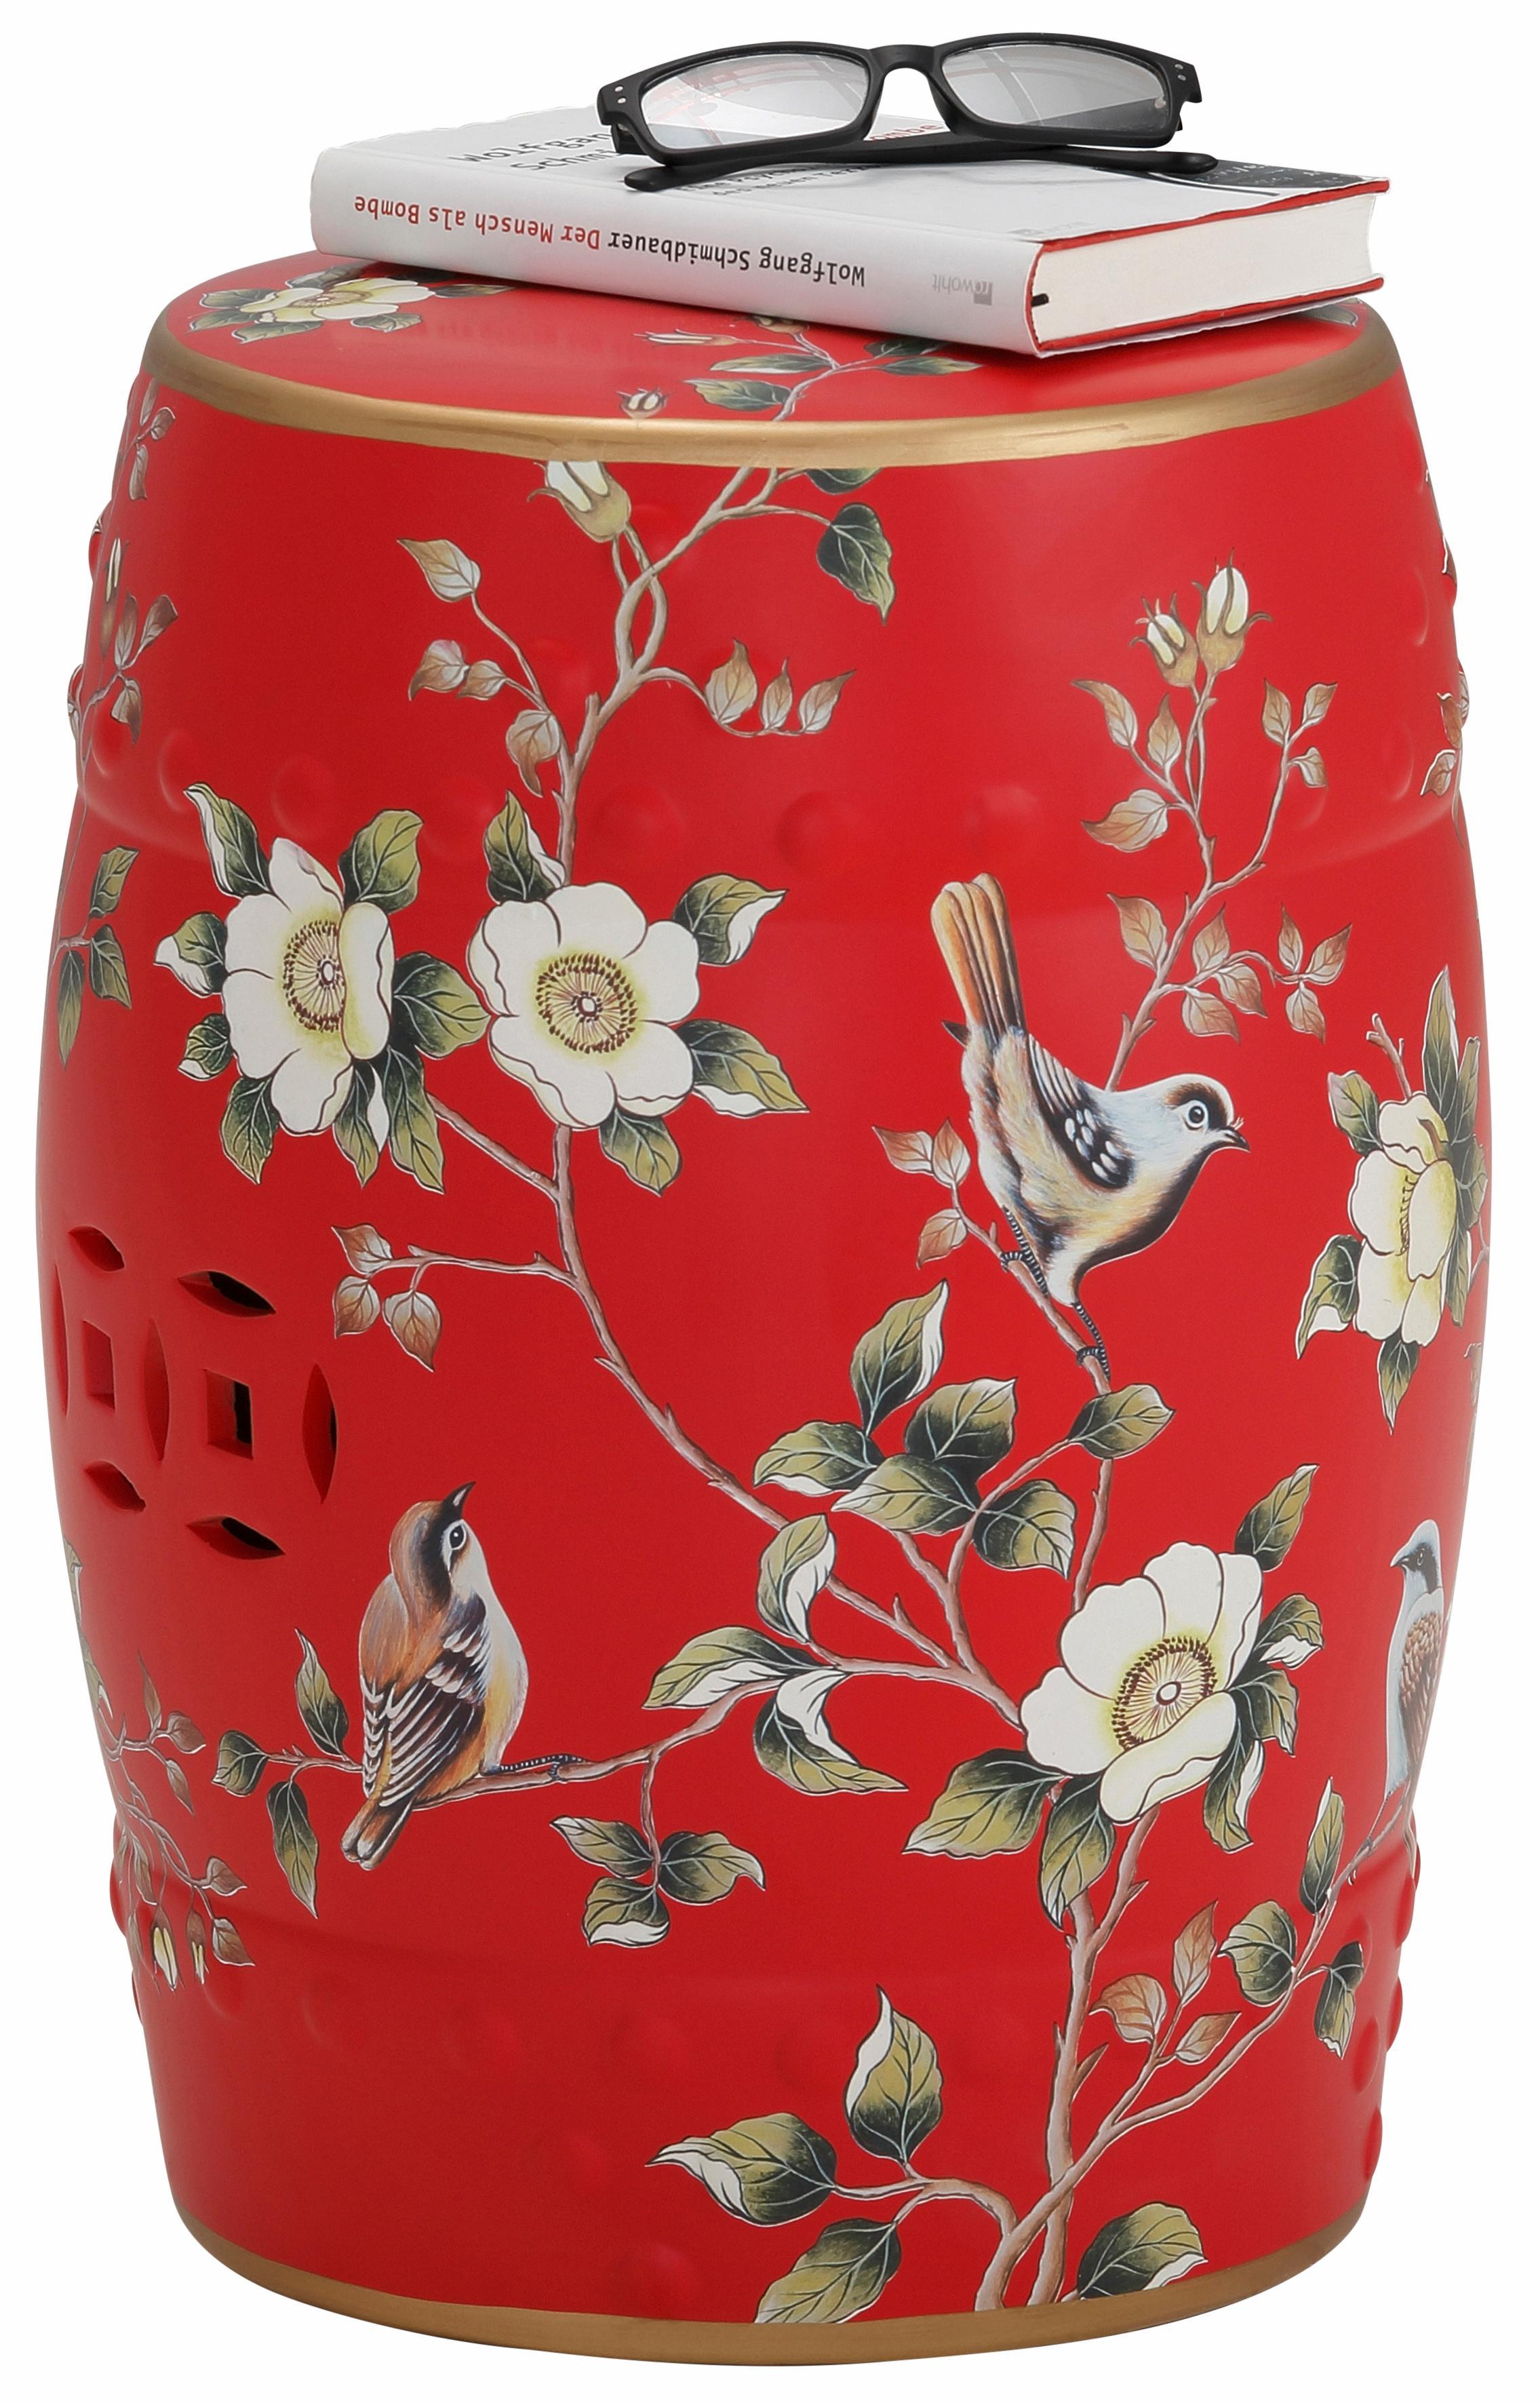 Home affaire Beistelltisch, aus Keramik rot Beistelltische Tische Beistelltisch